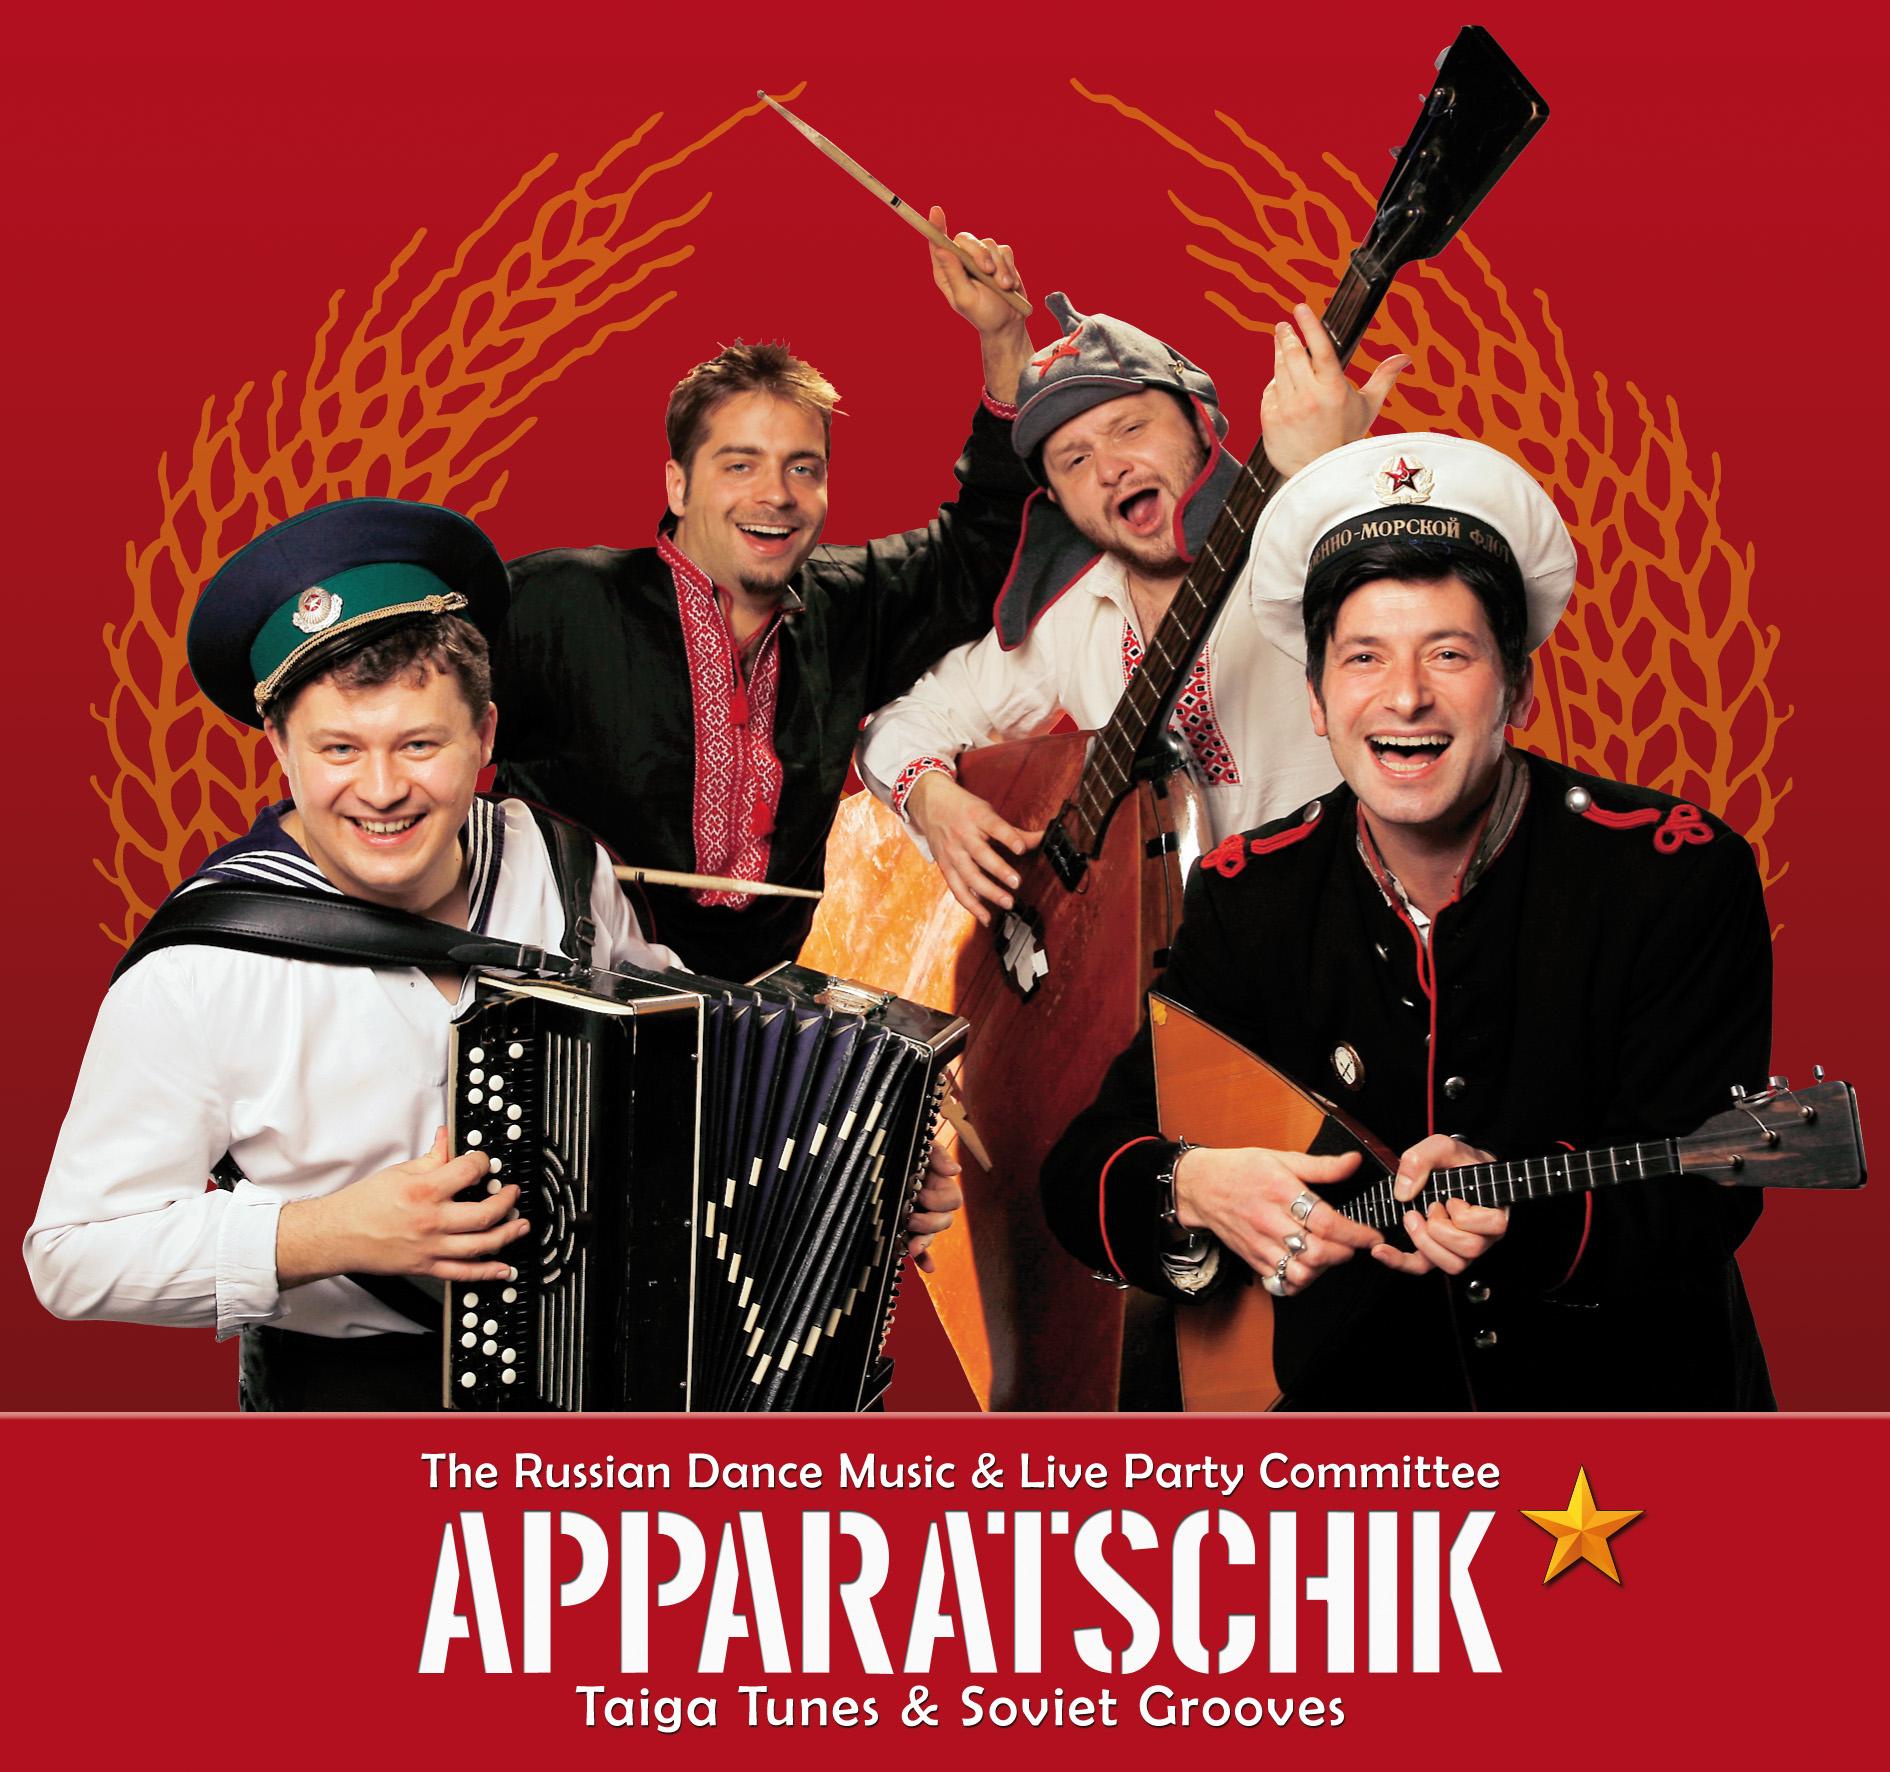 APPARATSCHIK (RU/UKR/DE) + KALIO GAYO + JUNKMAN'S CHOIR (SC) + DJ RAMSES HOPPA